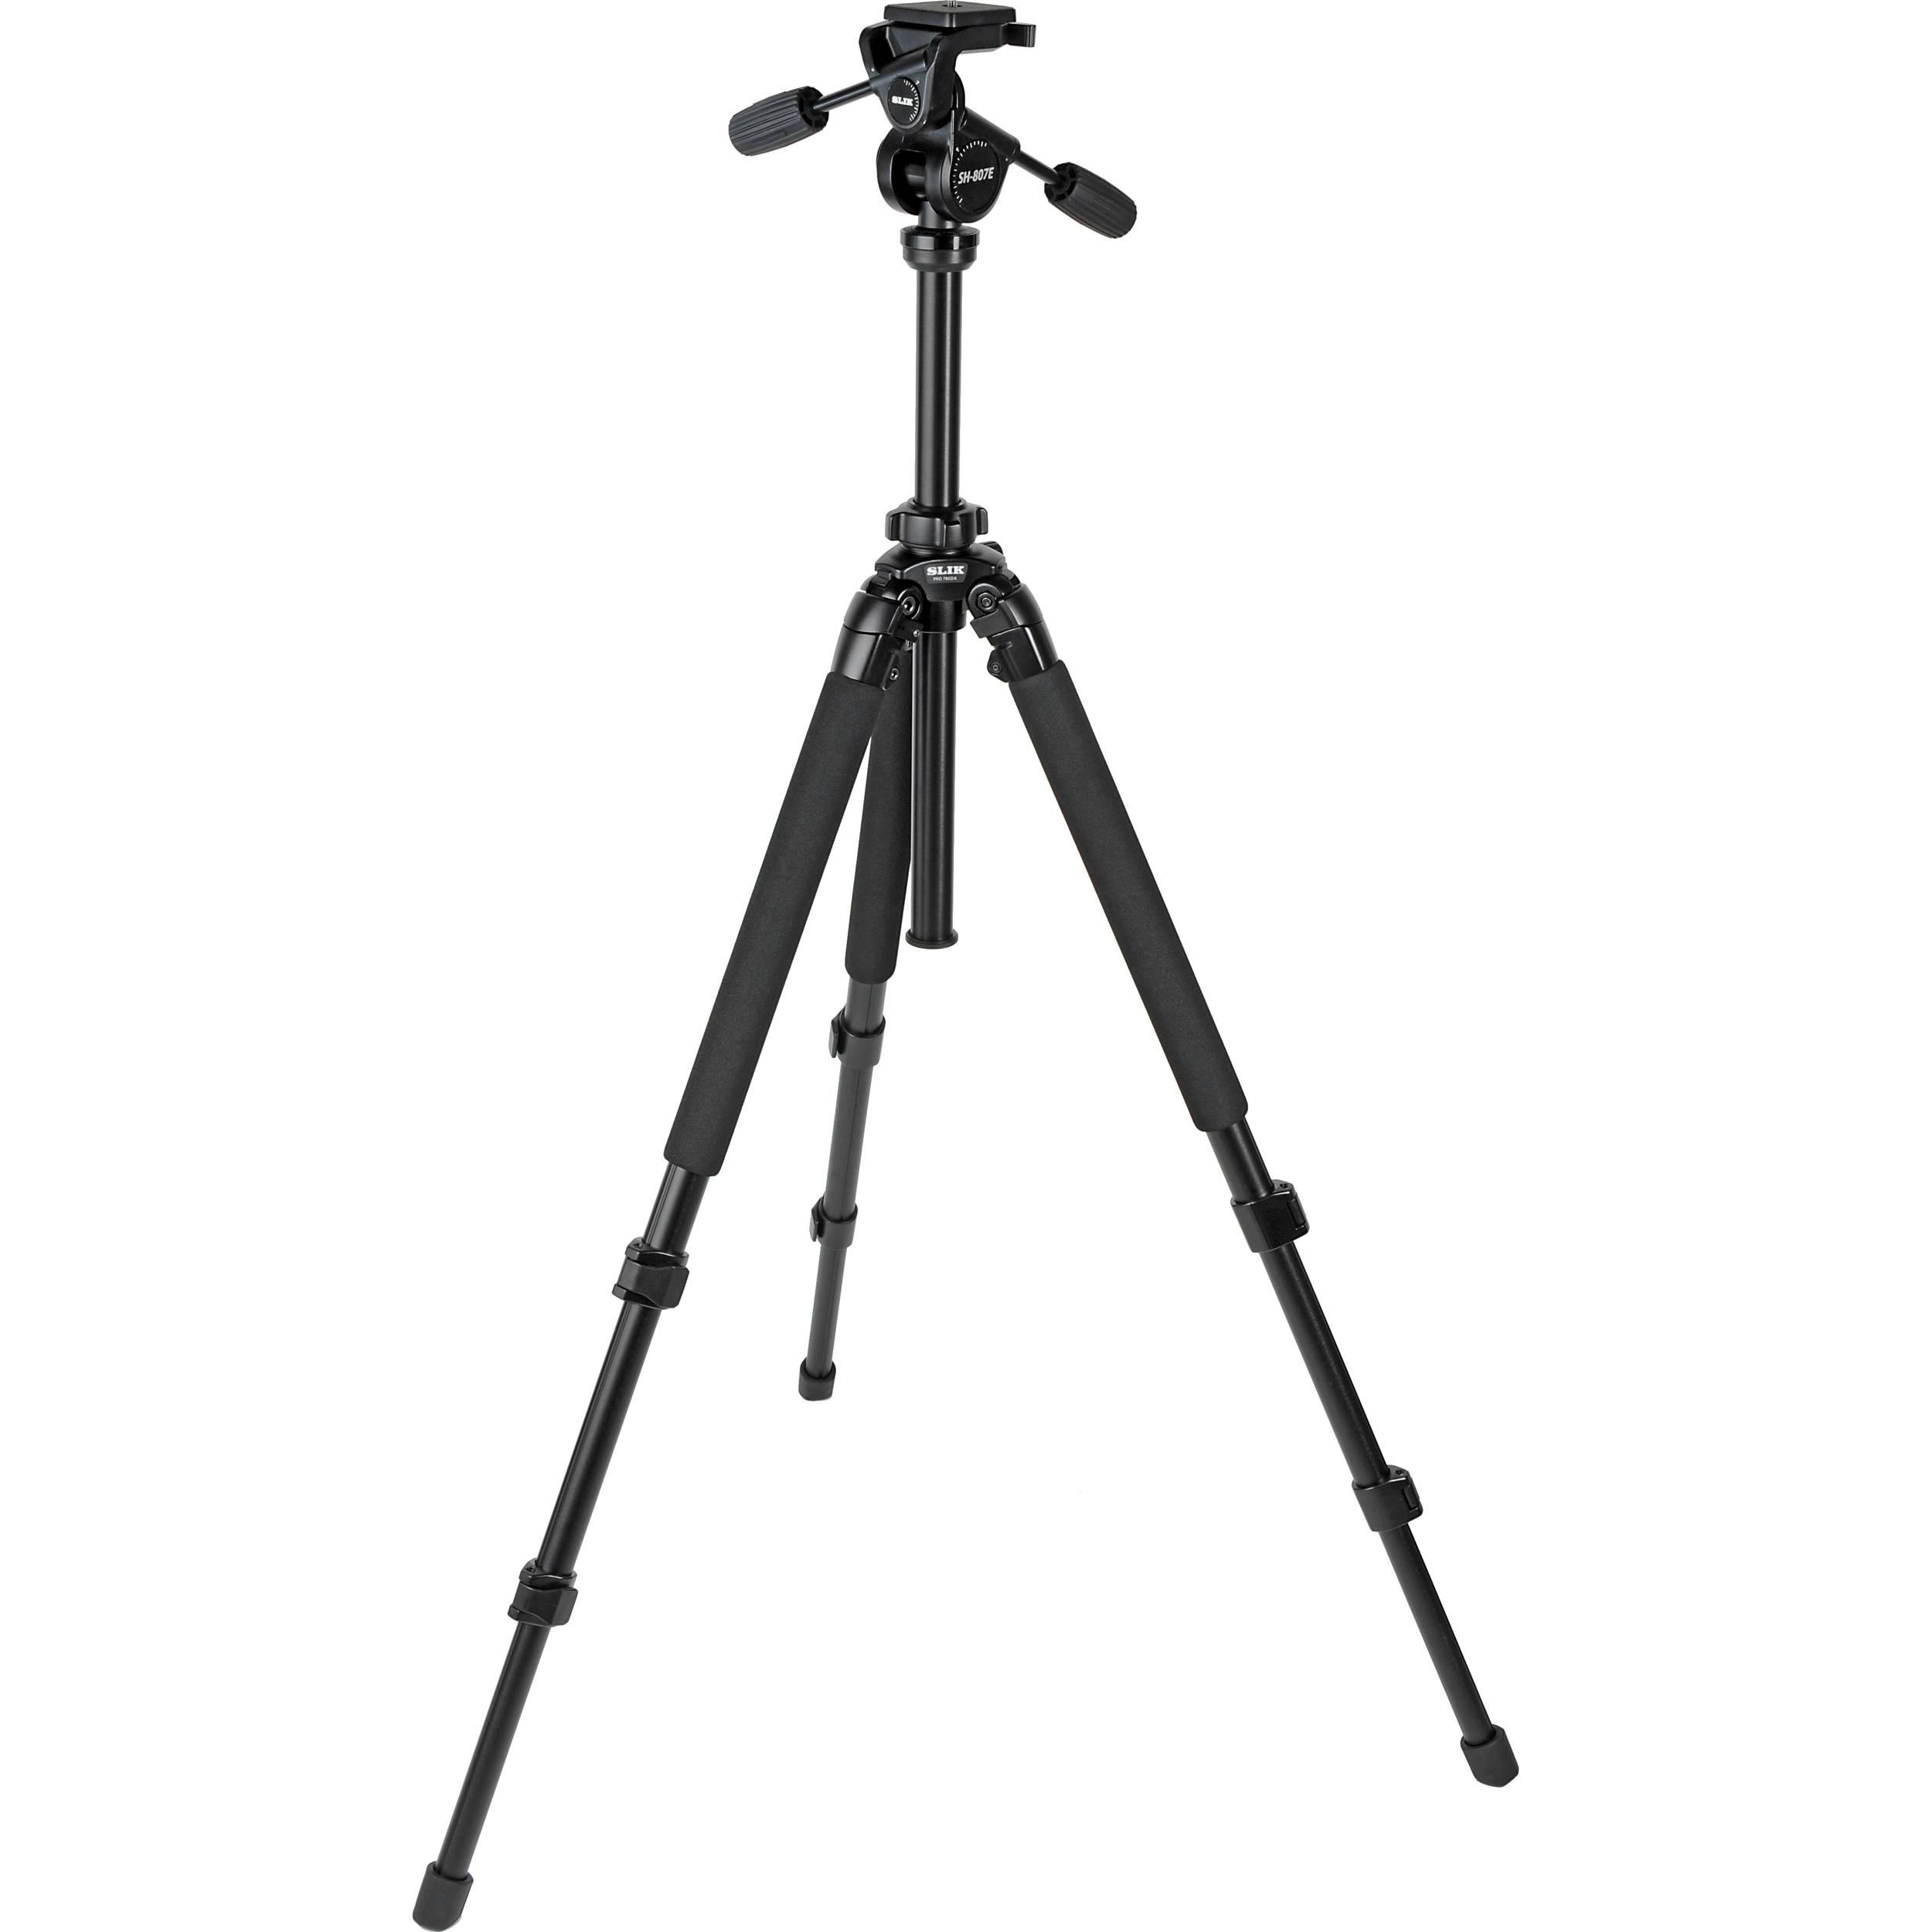 Slik Pro 780DX Tripod with 3-Way Head B&H Photo Video